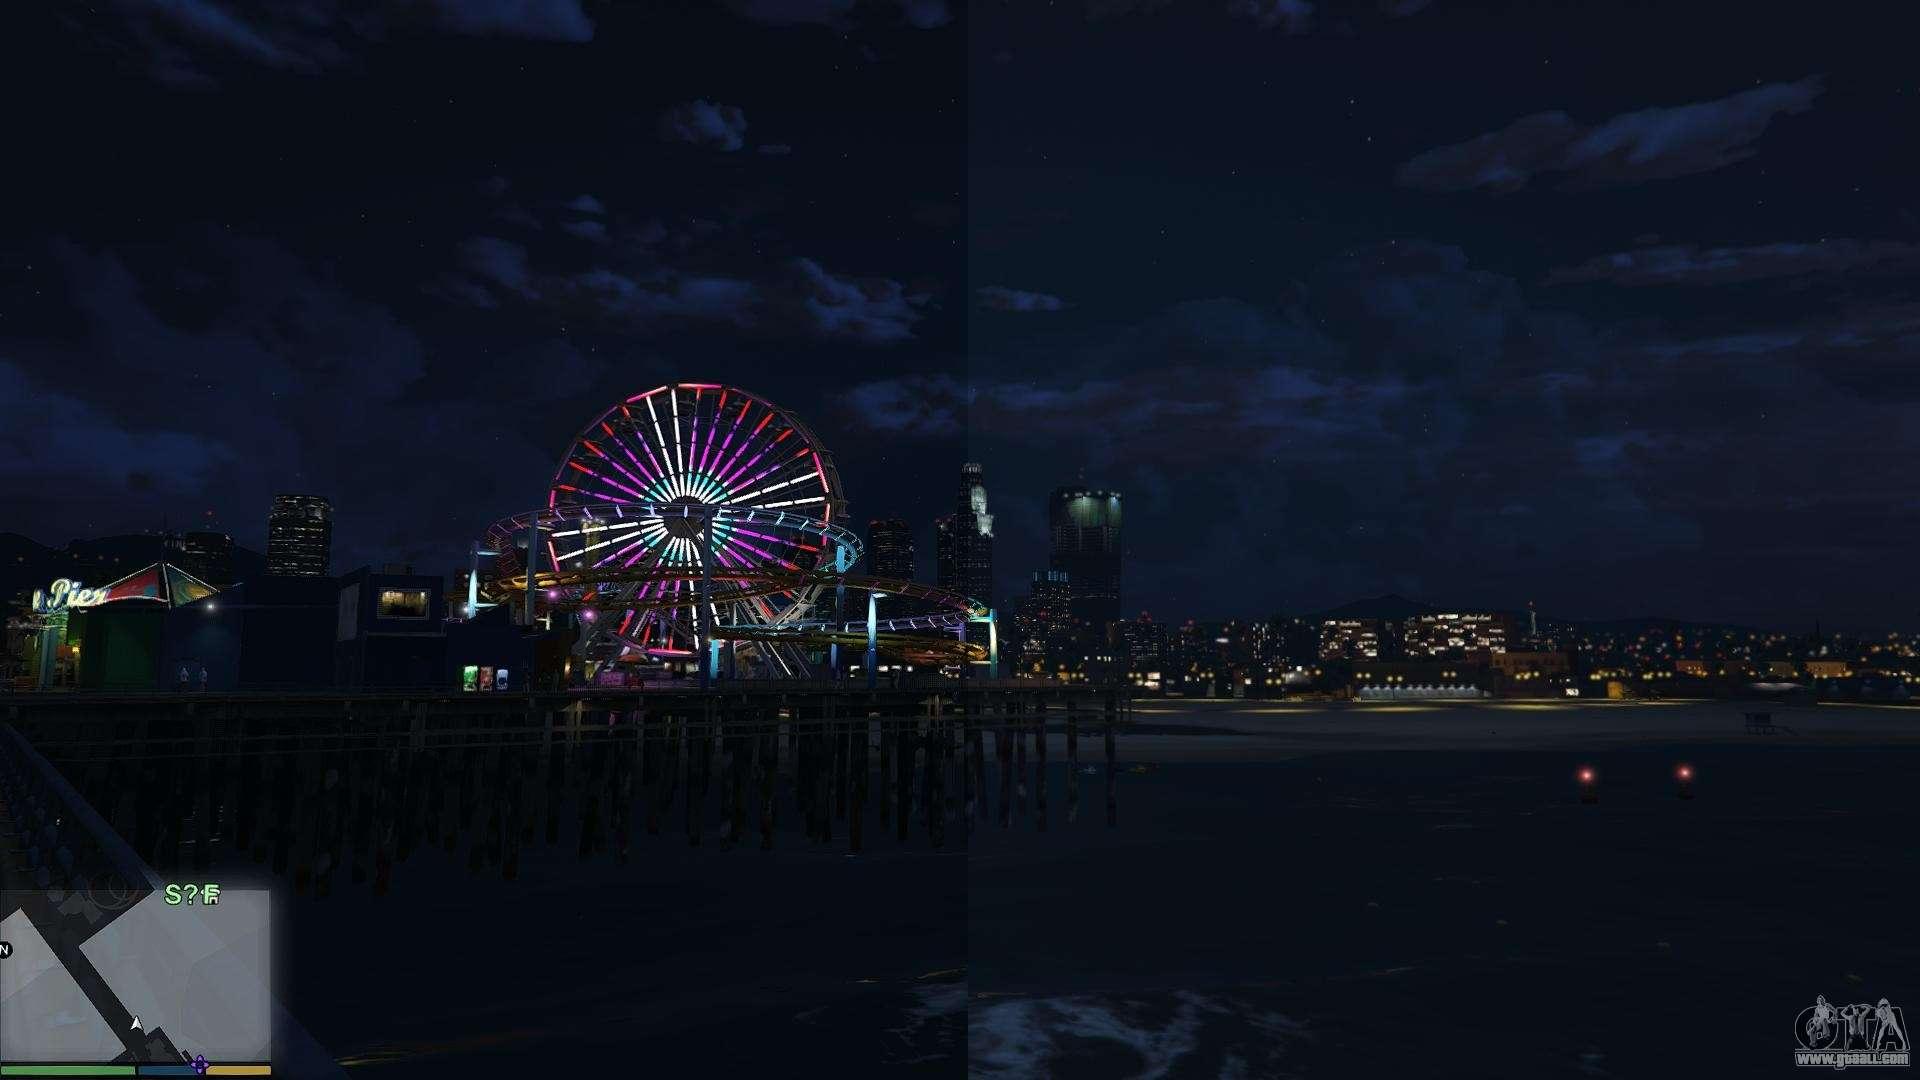 Top Five Gta San Andreas Pc Hd Graphics Mod - Circus